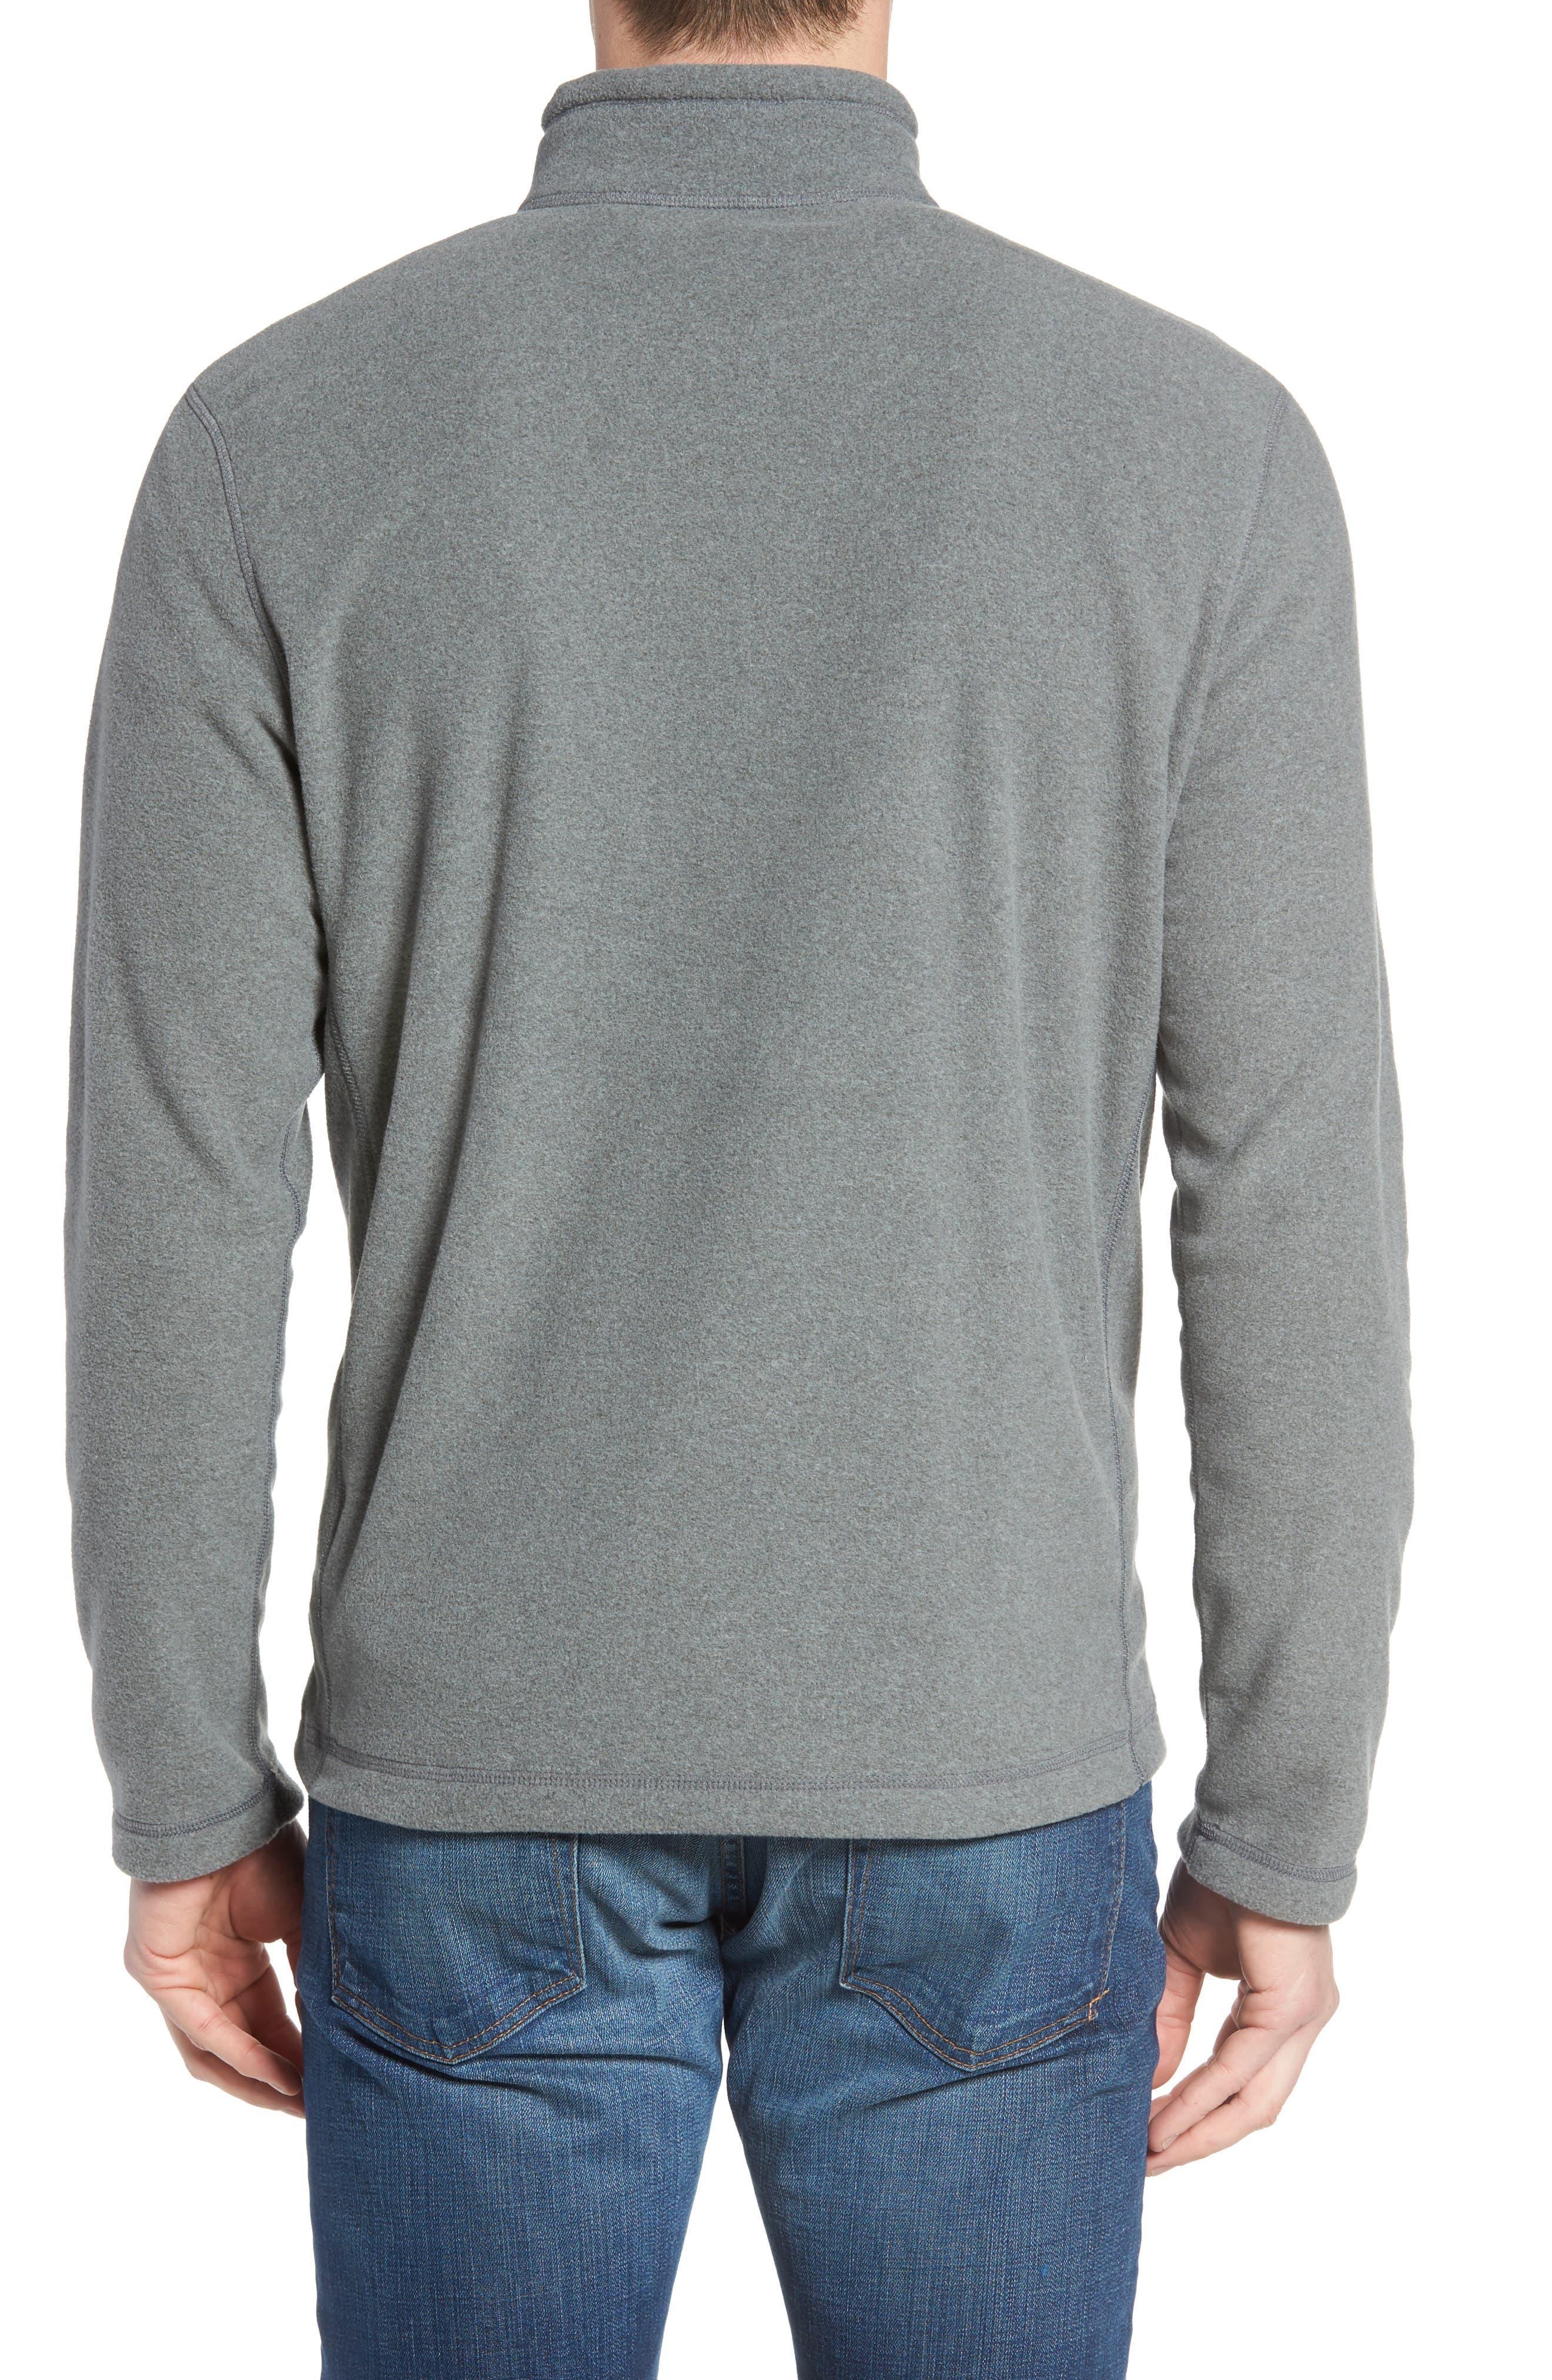 'TKA 100 Glacier' Quarter Zip Fleece Pullover,                             Alternate thumbnail 2, color,                             Tnf Medium Grey Heather